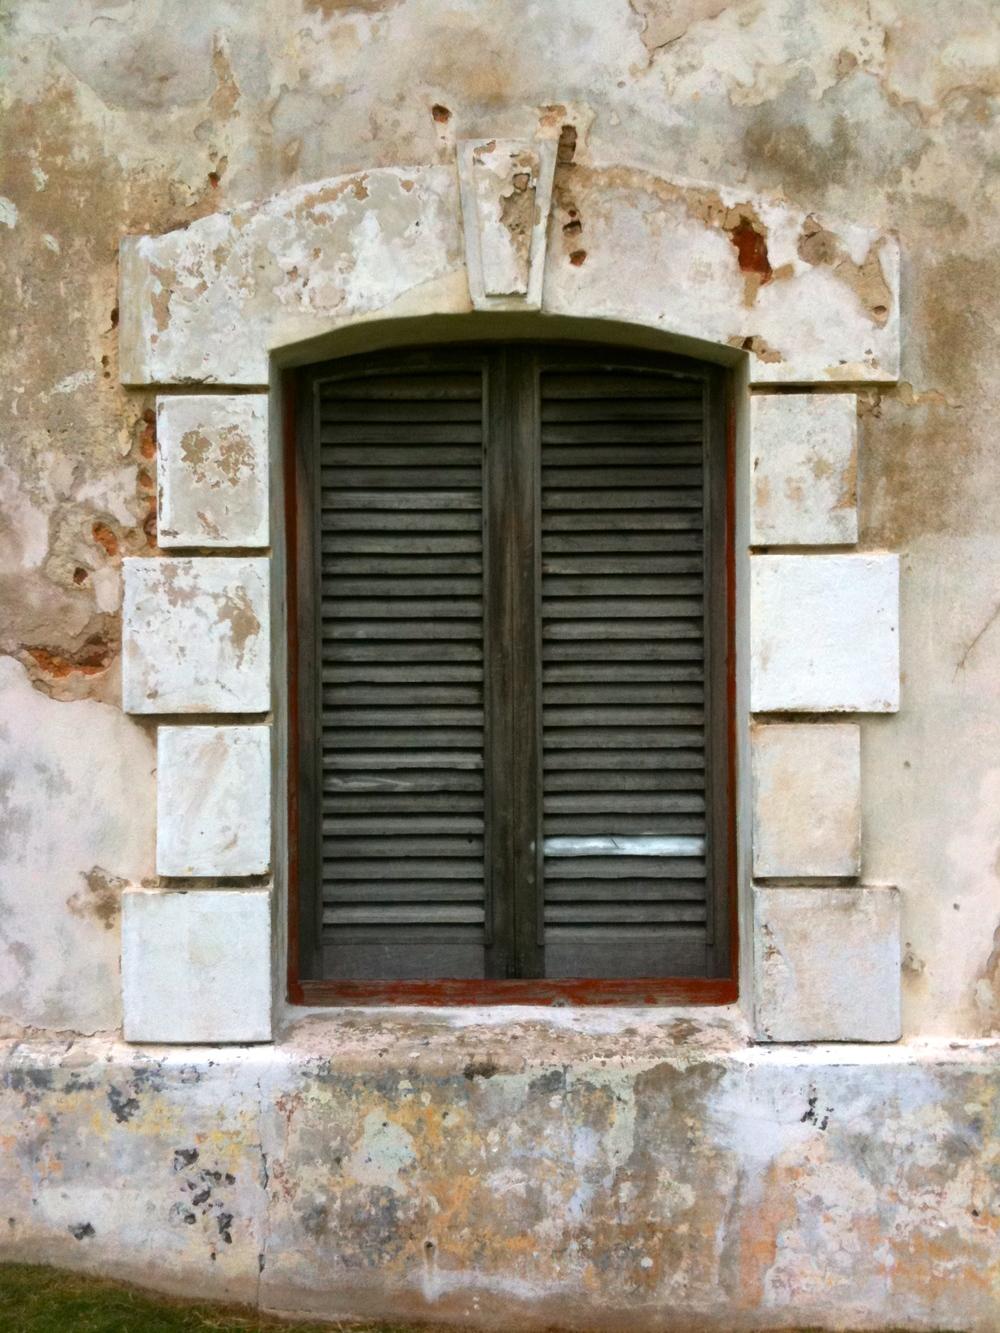 Architectural Details of San Juan, Puerto Rico